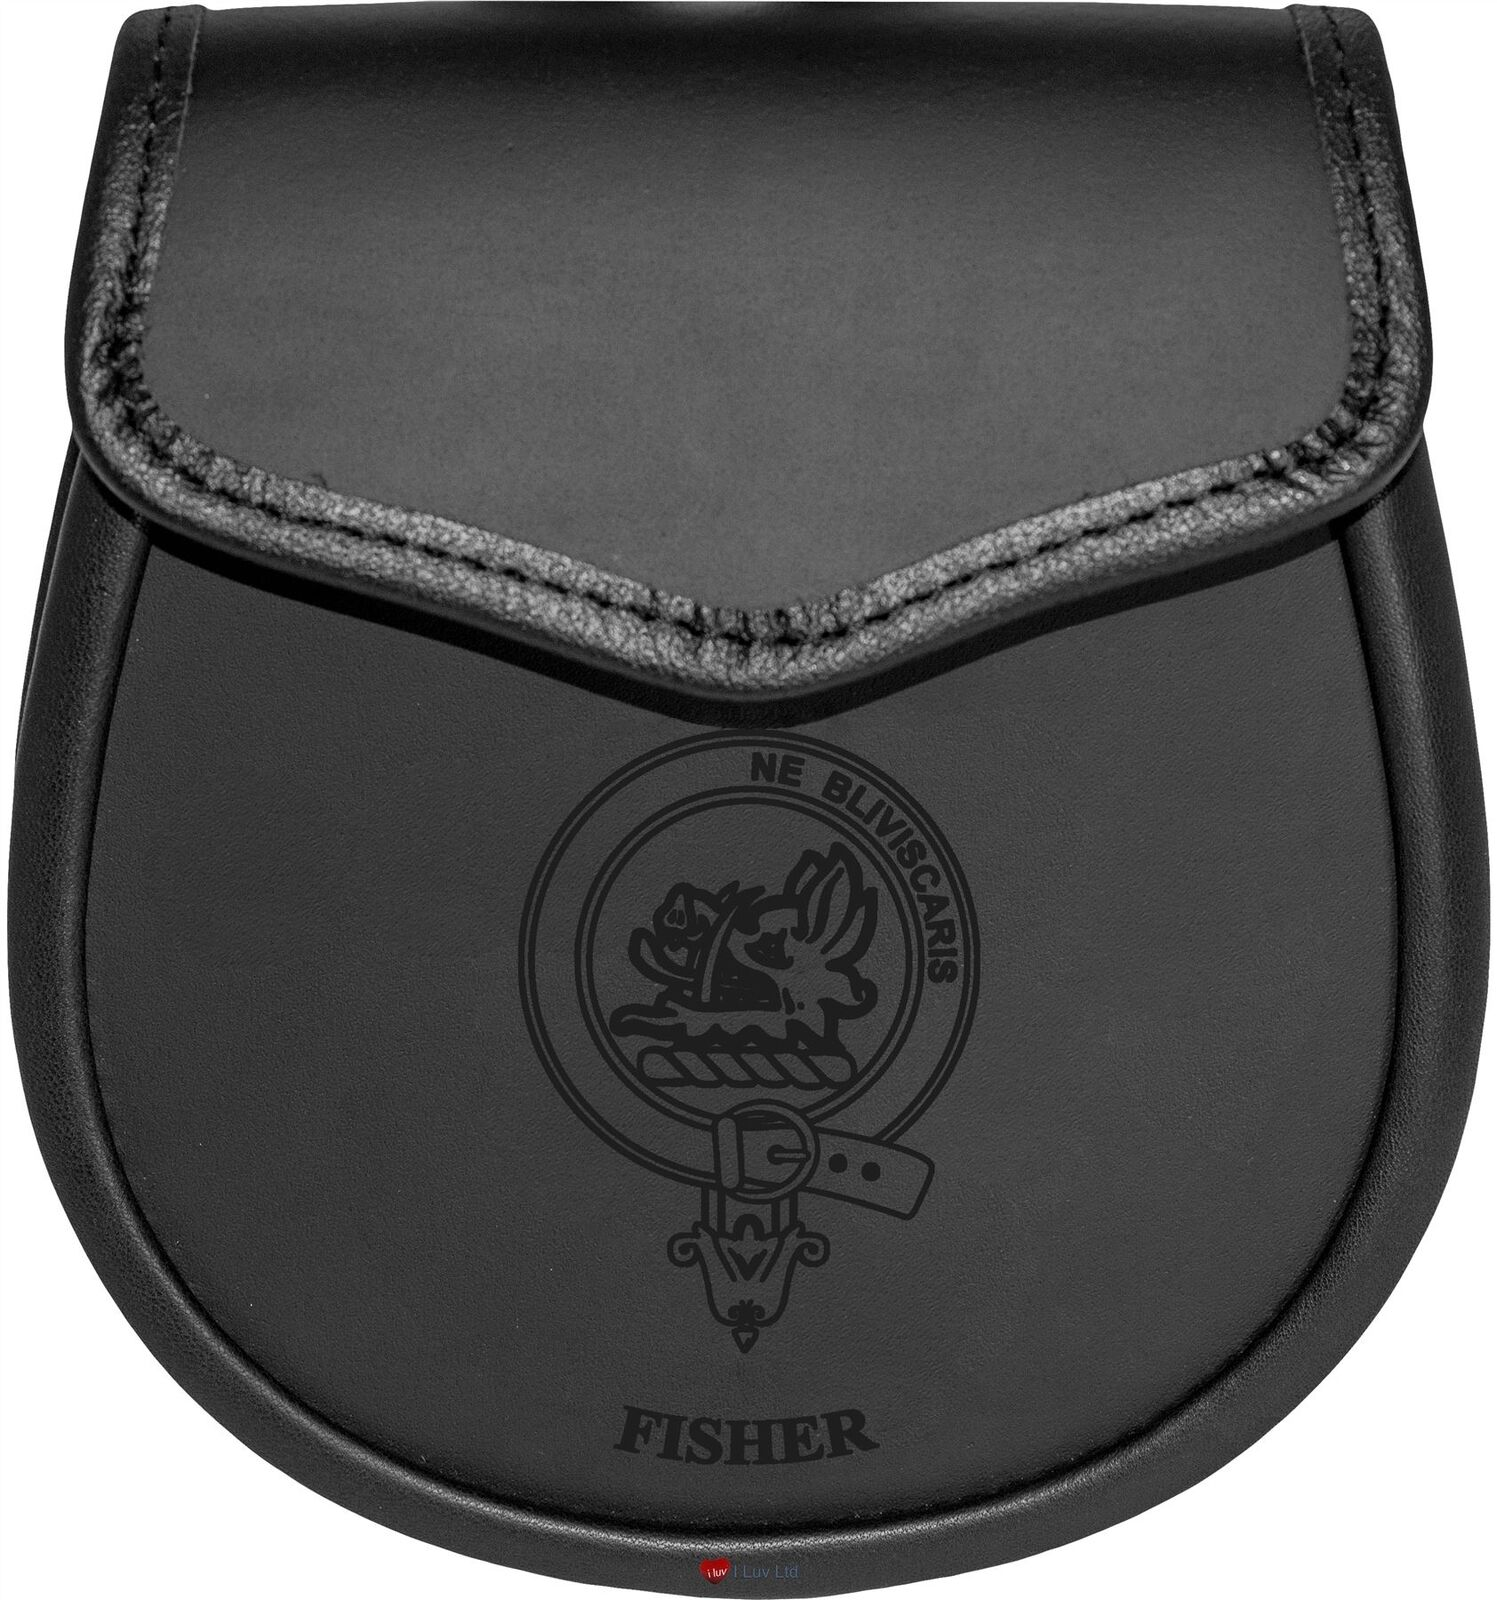 Fisher Leather Day Sporran Scottish Clan Crest